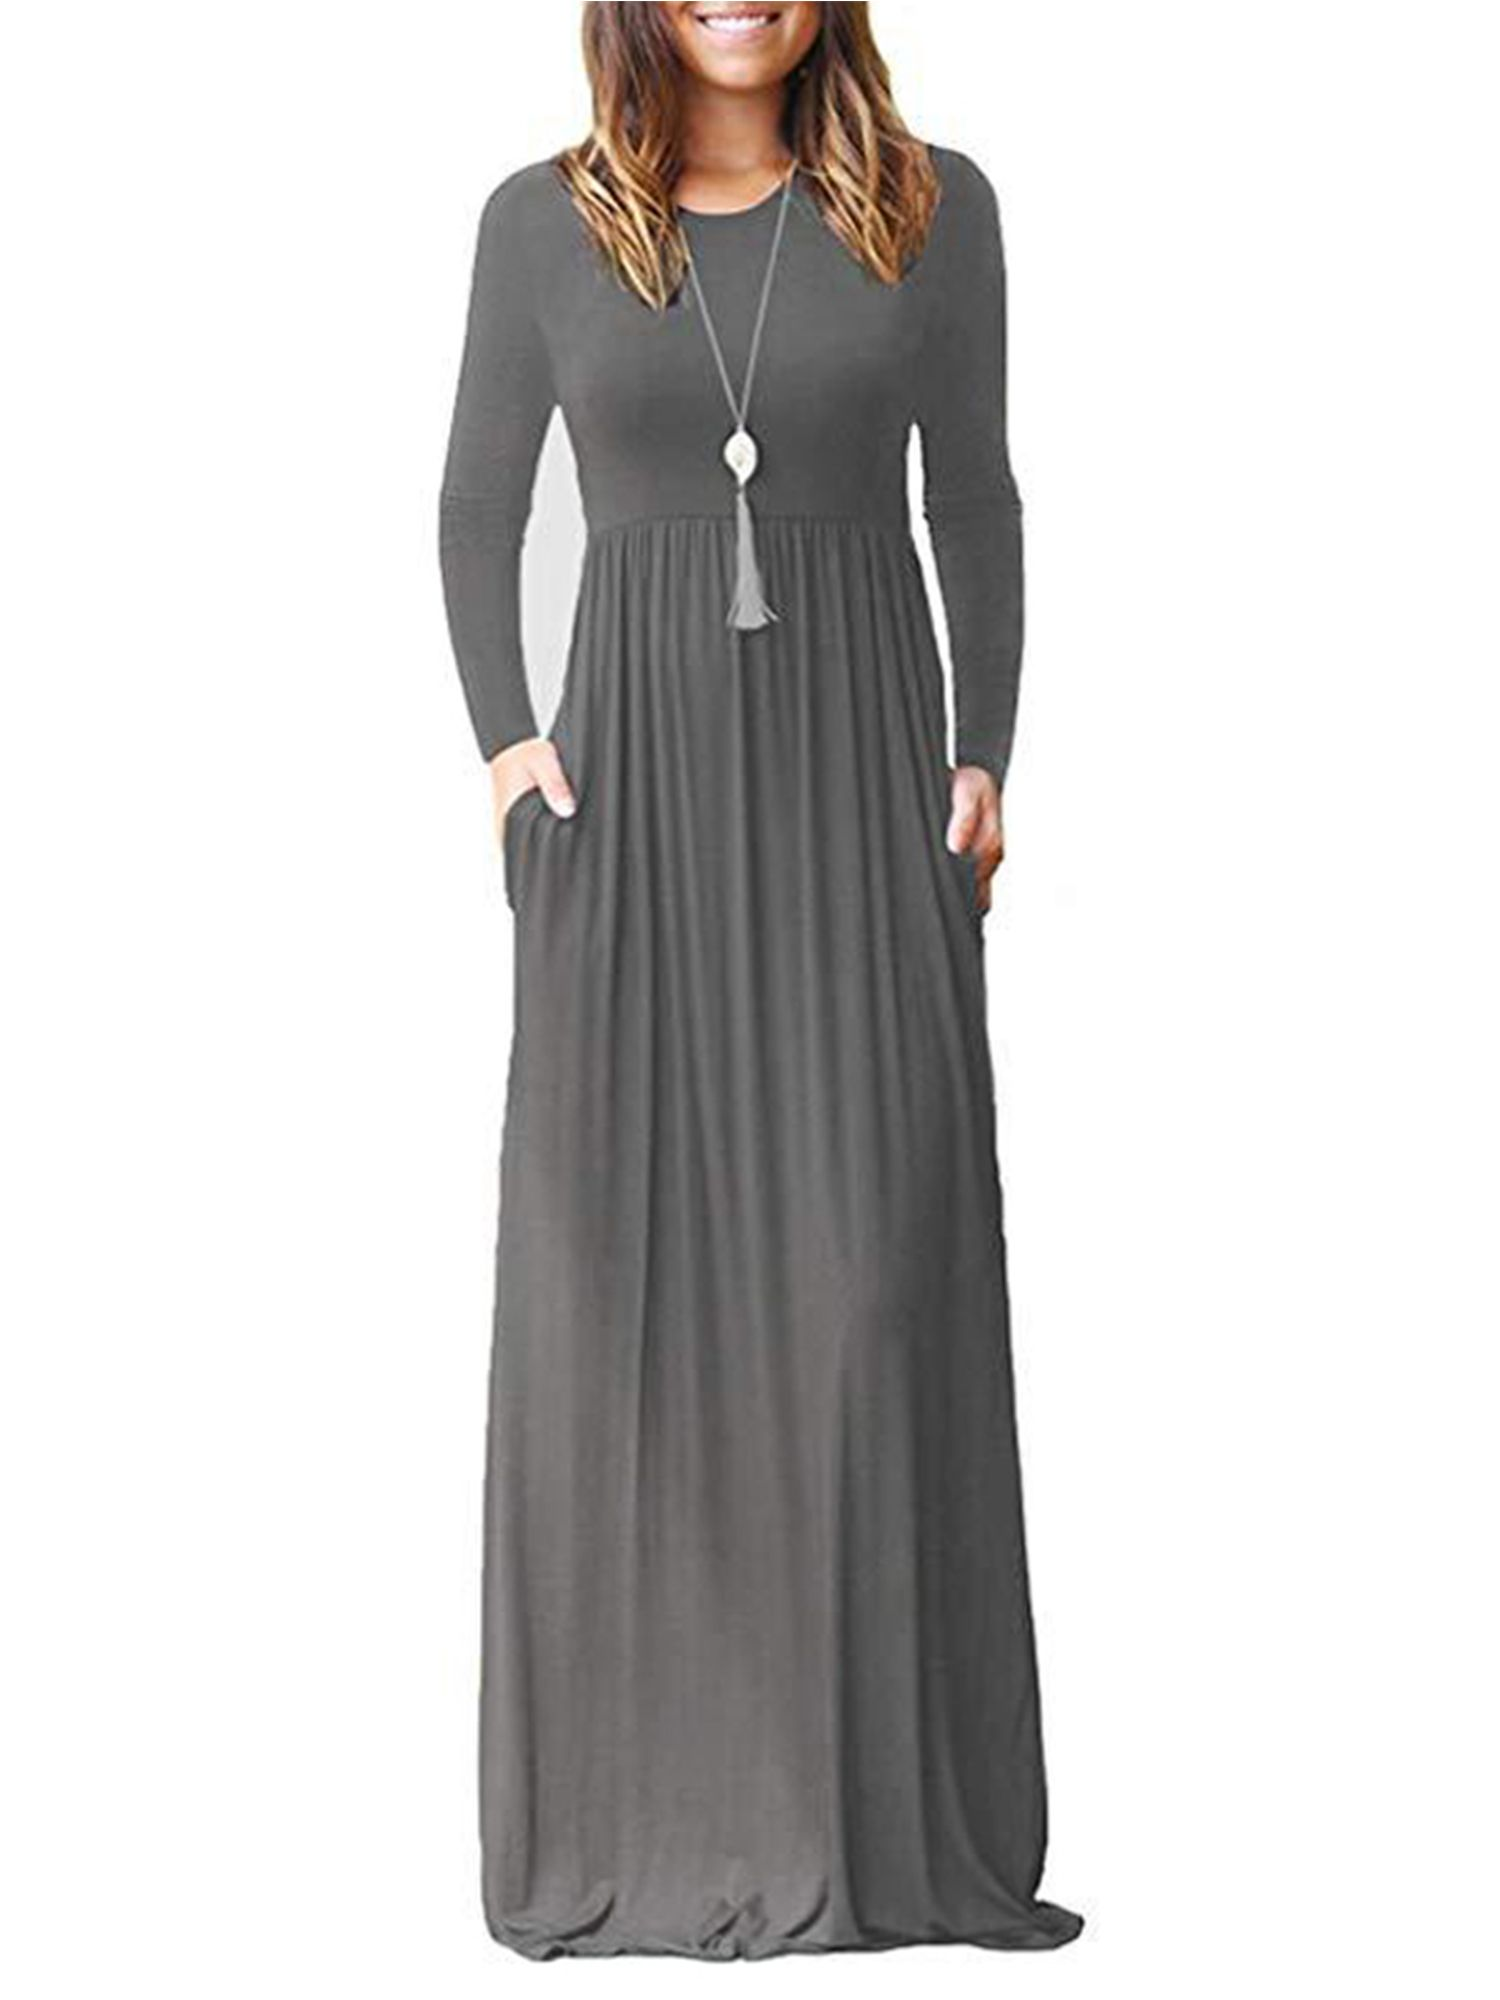 Wodstyle Women Casual Long Sleeve Plain Party Boho Maxi Dress Walmart Com Long Dress Casual Maxi Dresses Casual Maxi Dress [ 2000 x 1500 Pixel ]